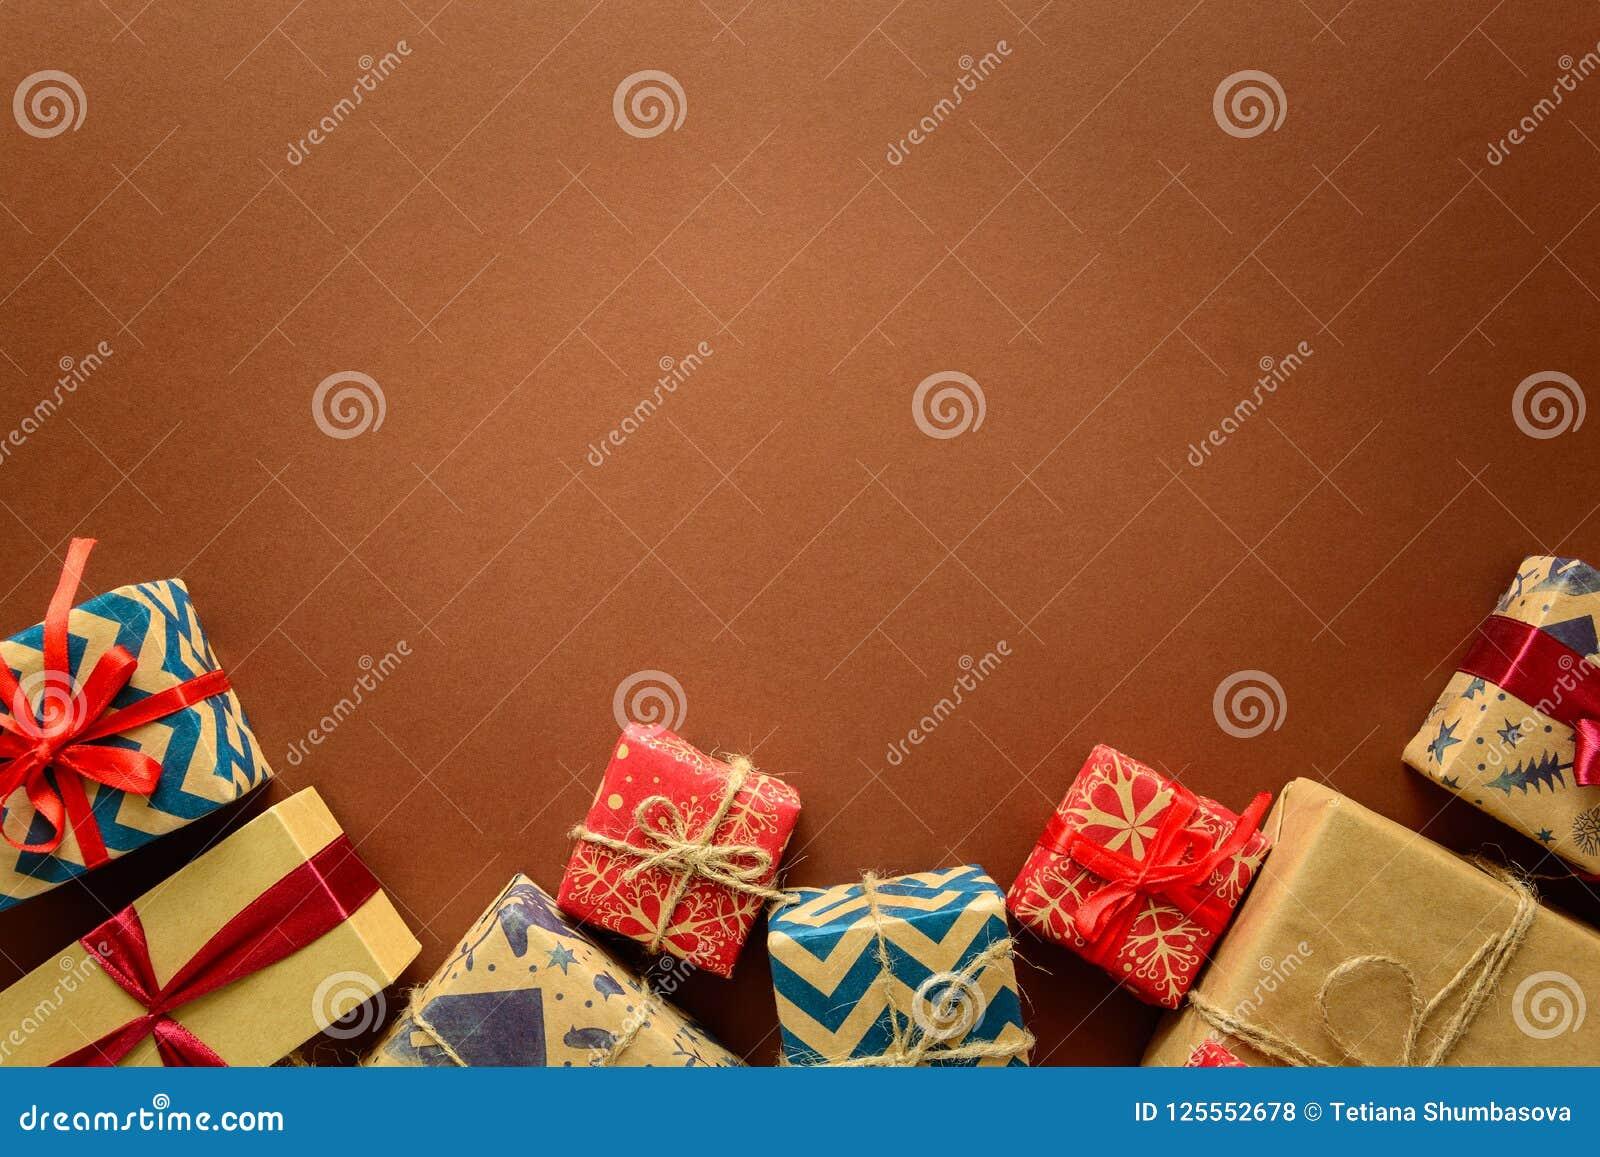 Regali Di Natale Di Carta.Vista Superiore Sui Regali Di Natale Avvolti In Carta Del